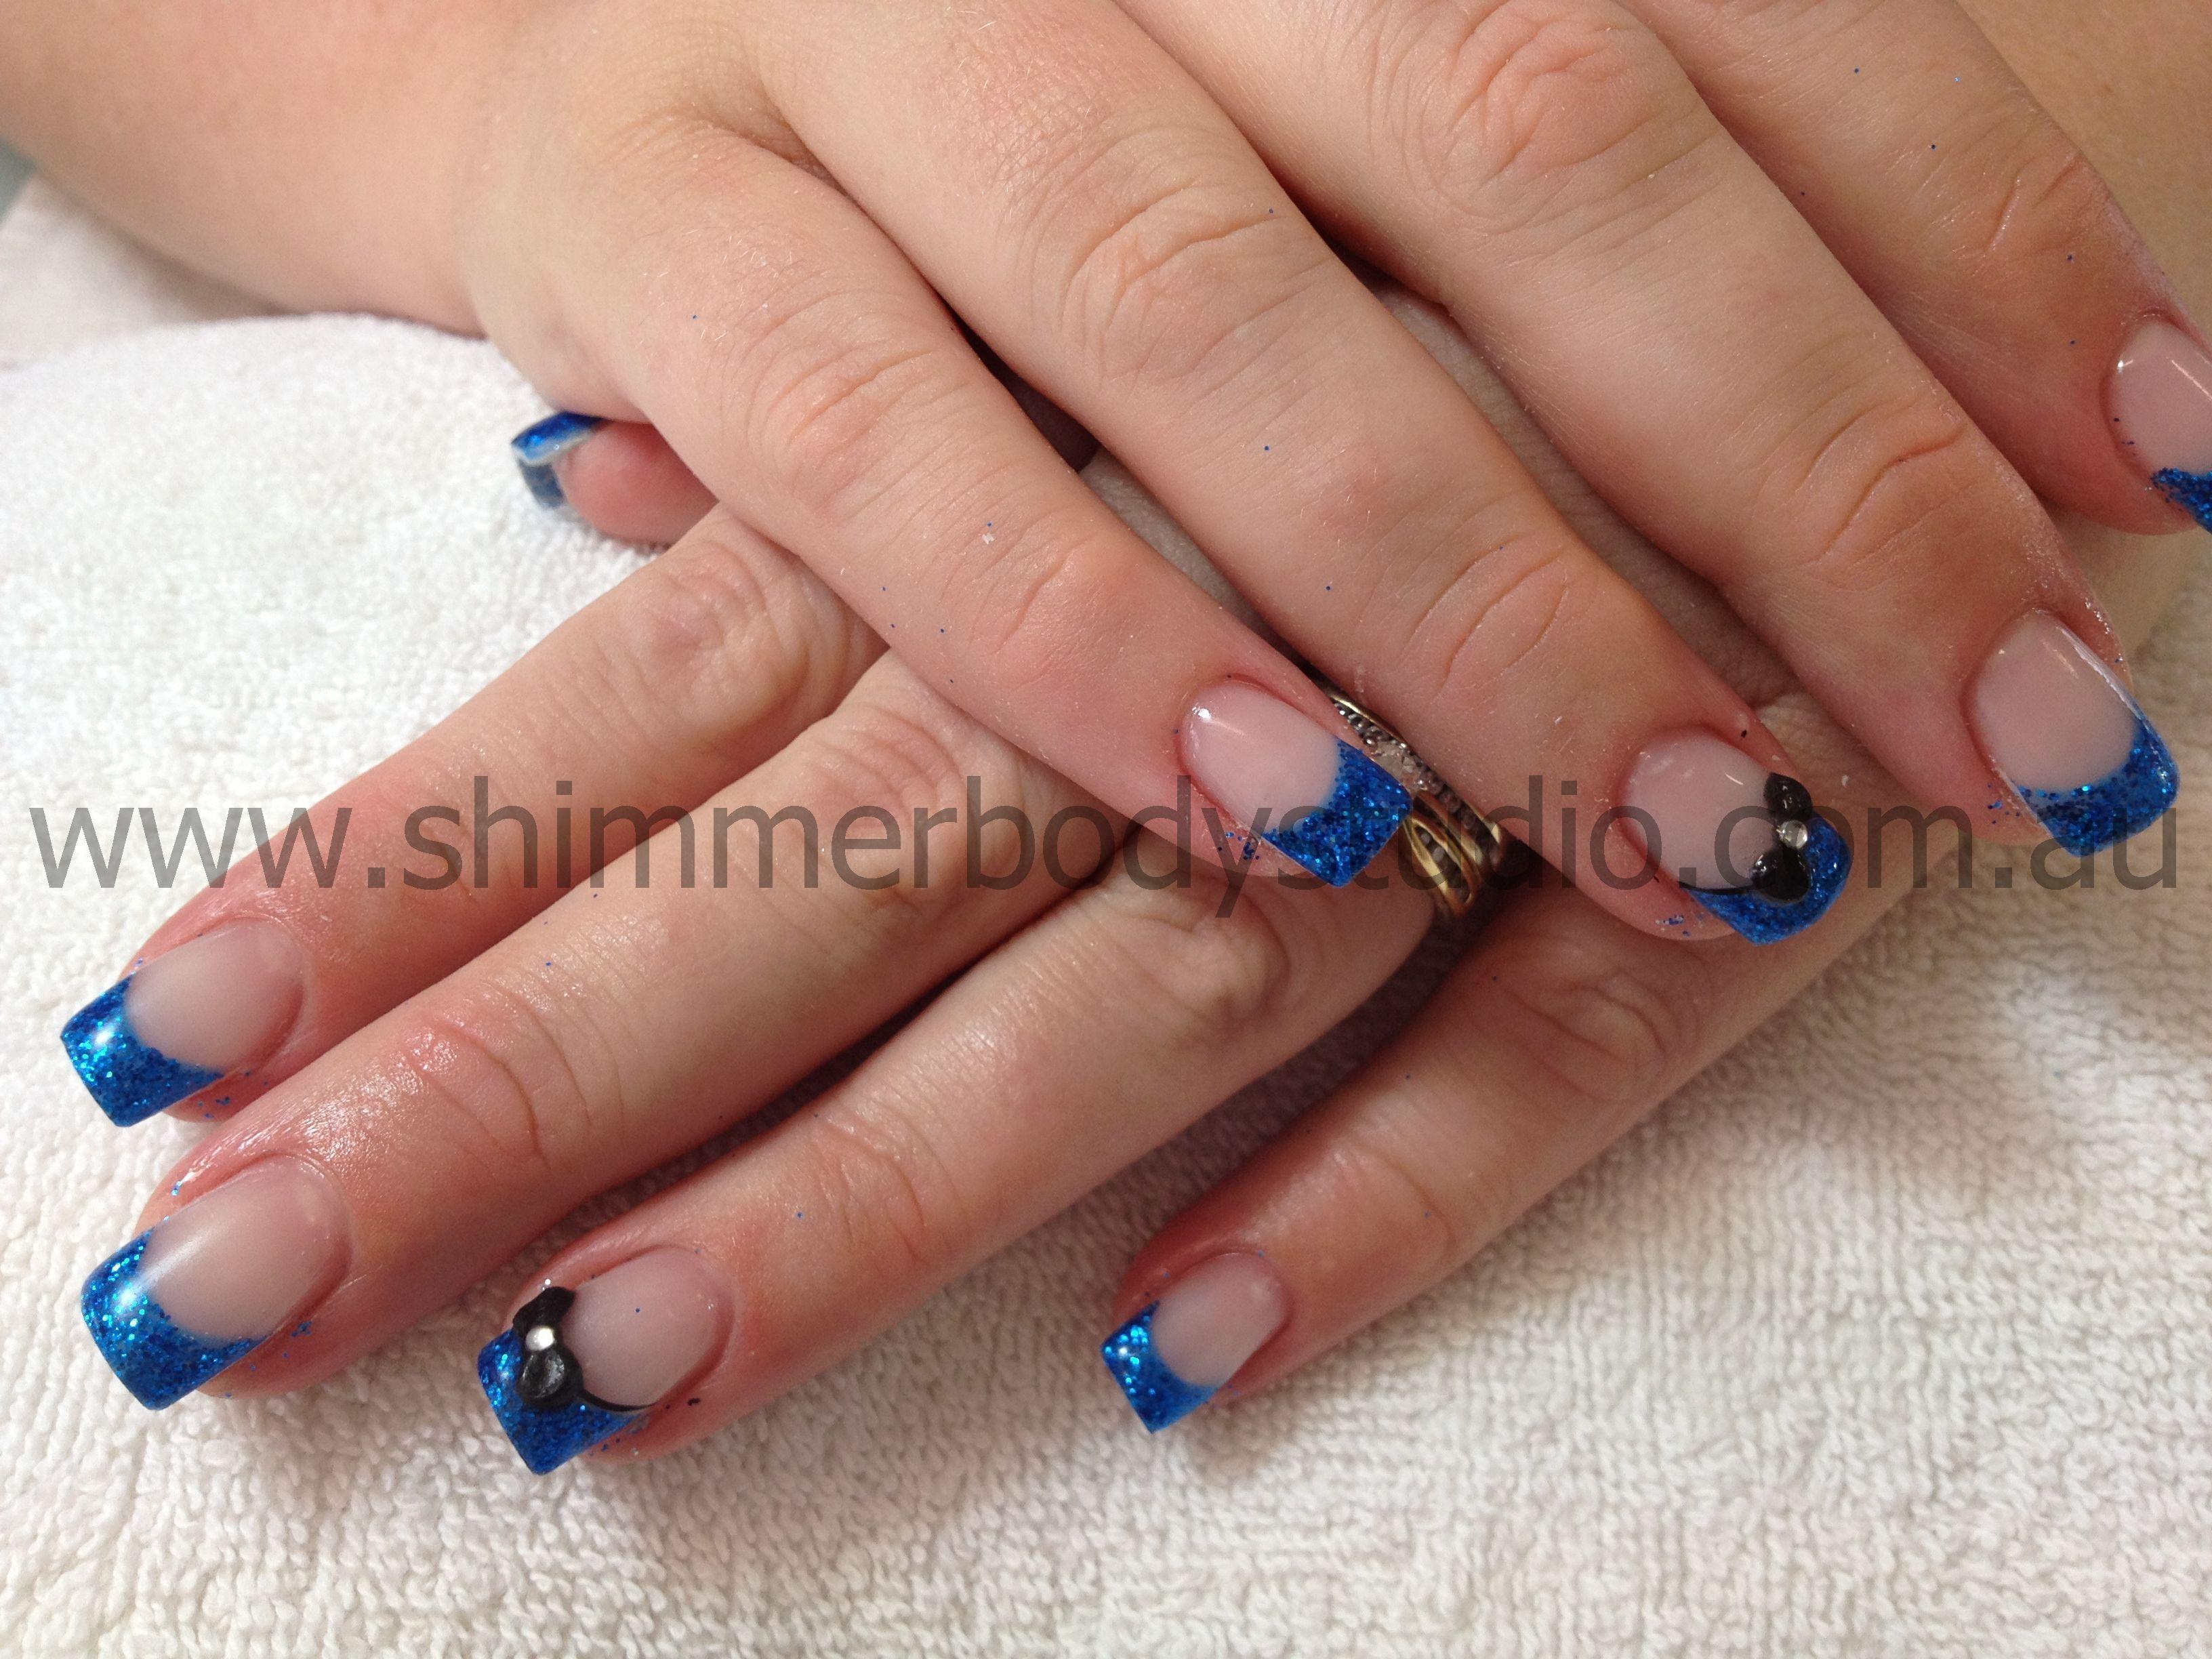 Gel nails, Colour Nails, Blue nails, 3d nail Art, Black Bows ...